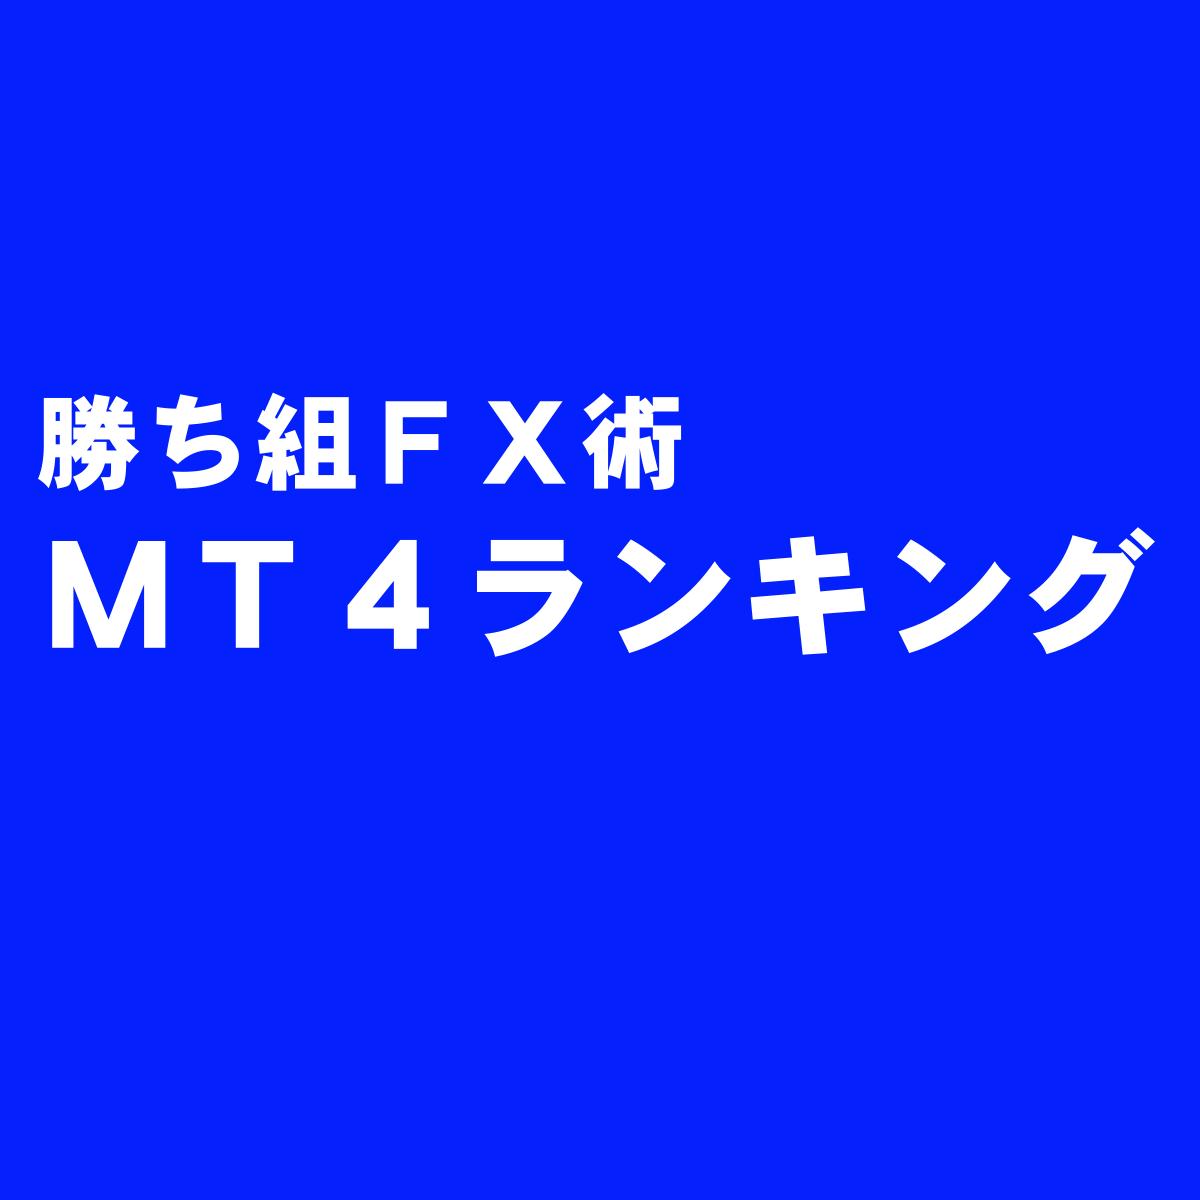 MT4ランキング